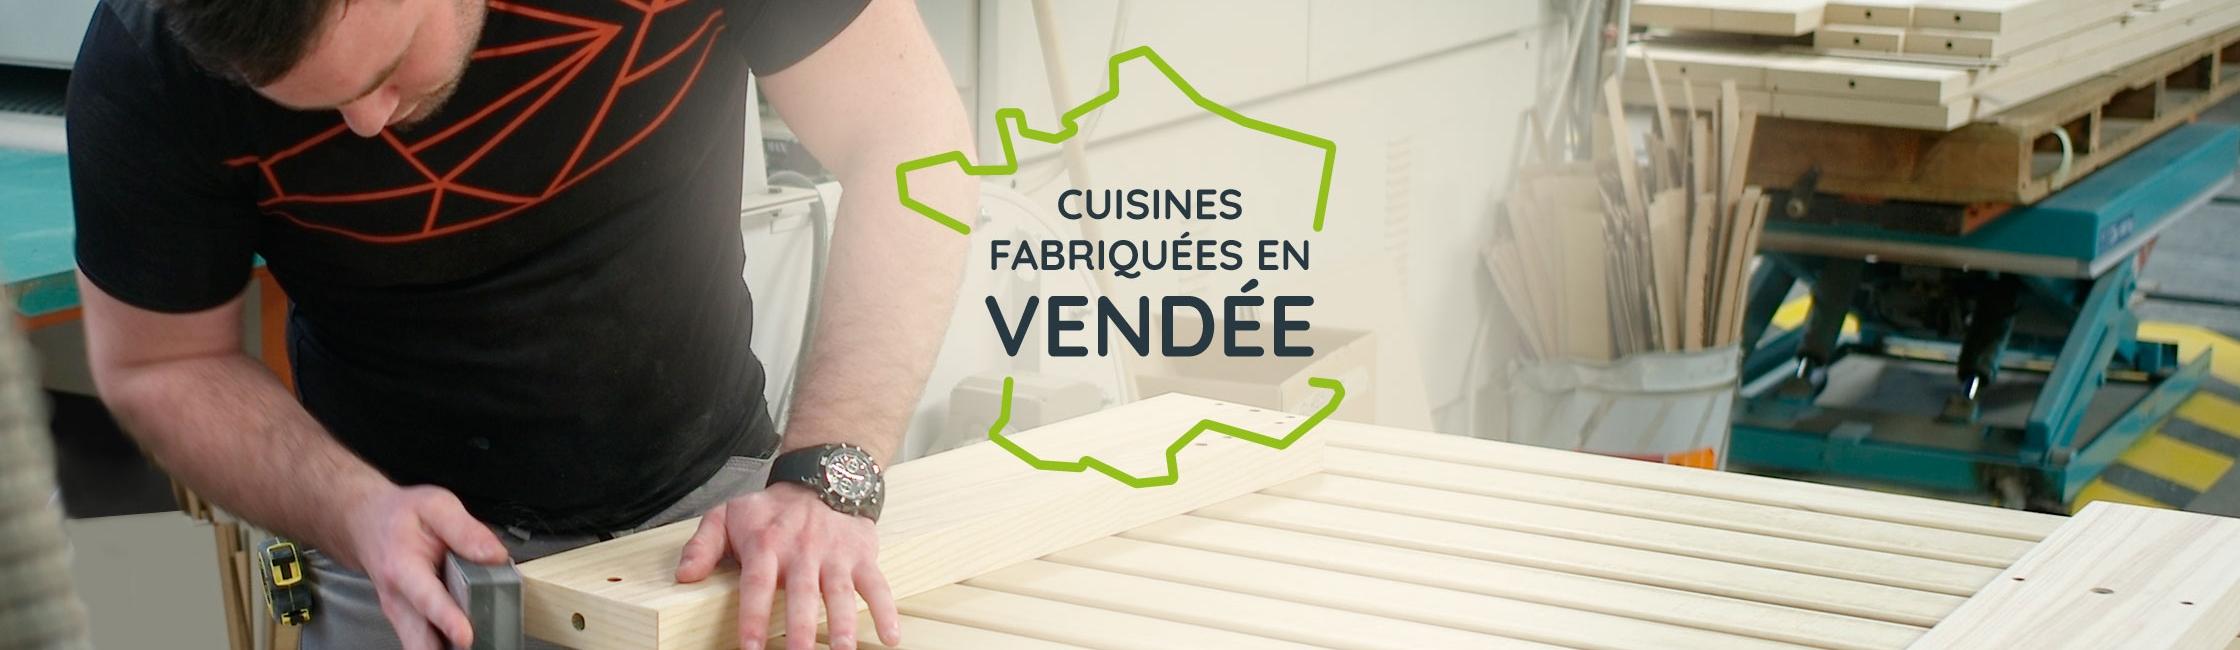 cuisines fabriquees en vendee